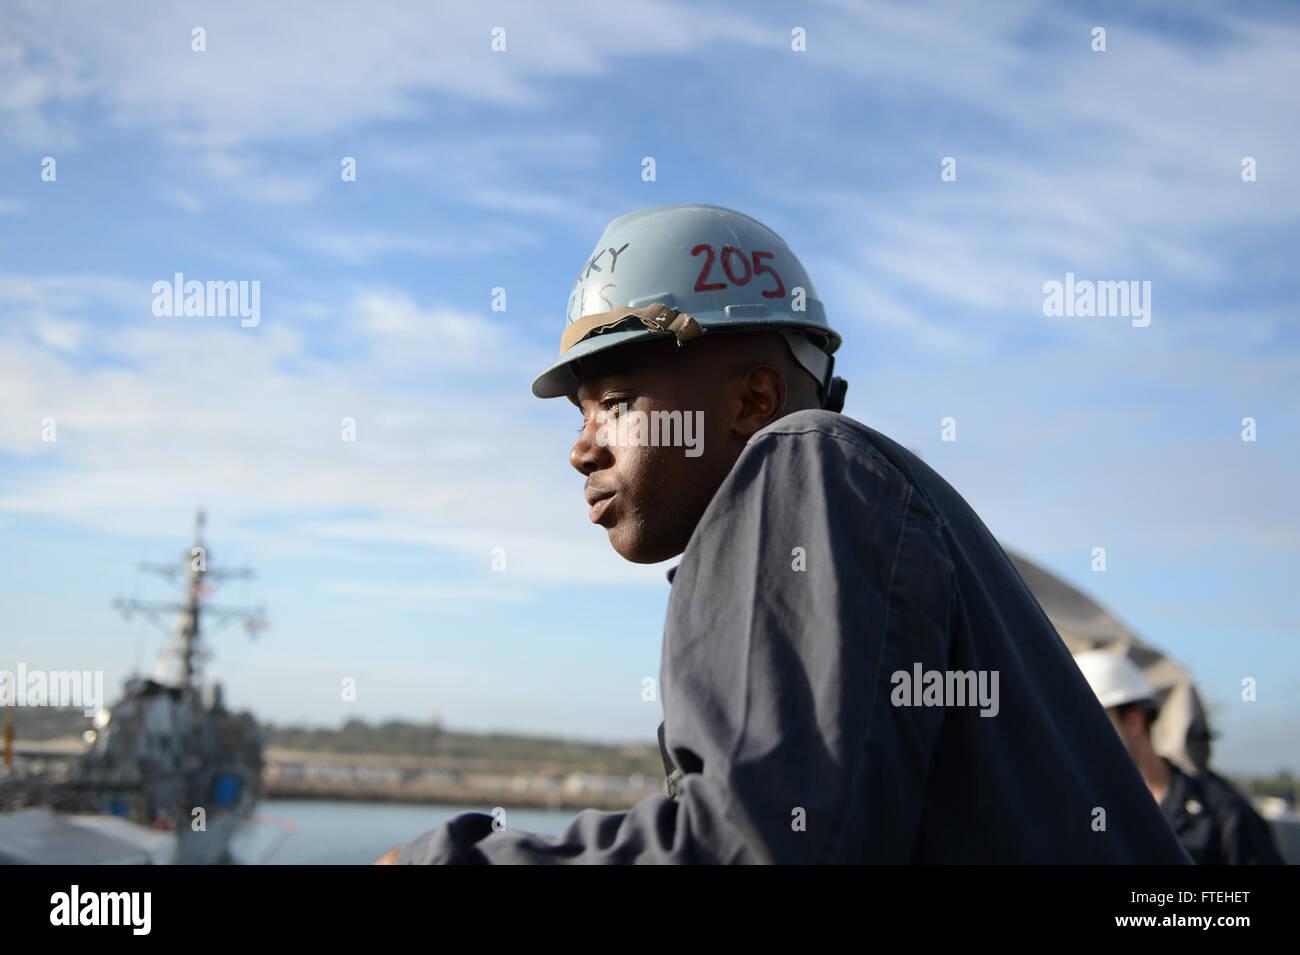 MEDITERRANEAN SEA (Oct. 15, 2014) -- Boatswain's Mate Seaman Darren Marks, from Tuscaloosa, Ala., from Rancho Cucamonga, - Stock Image